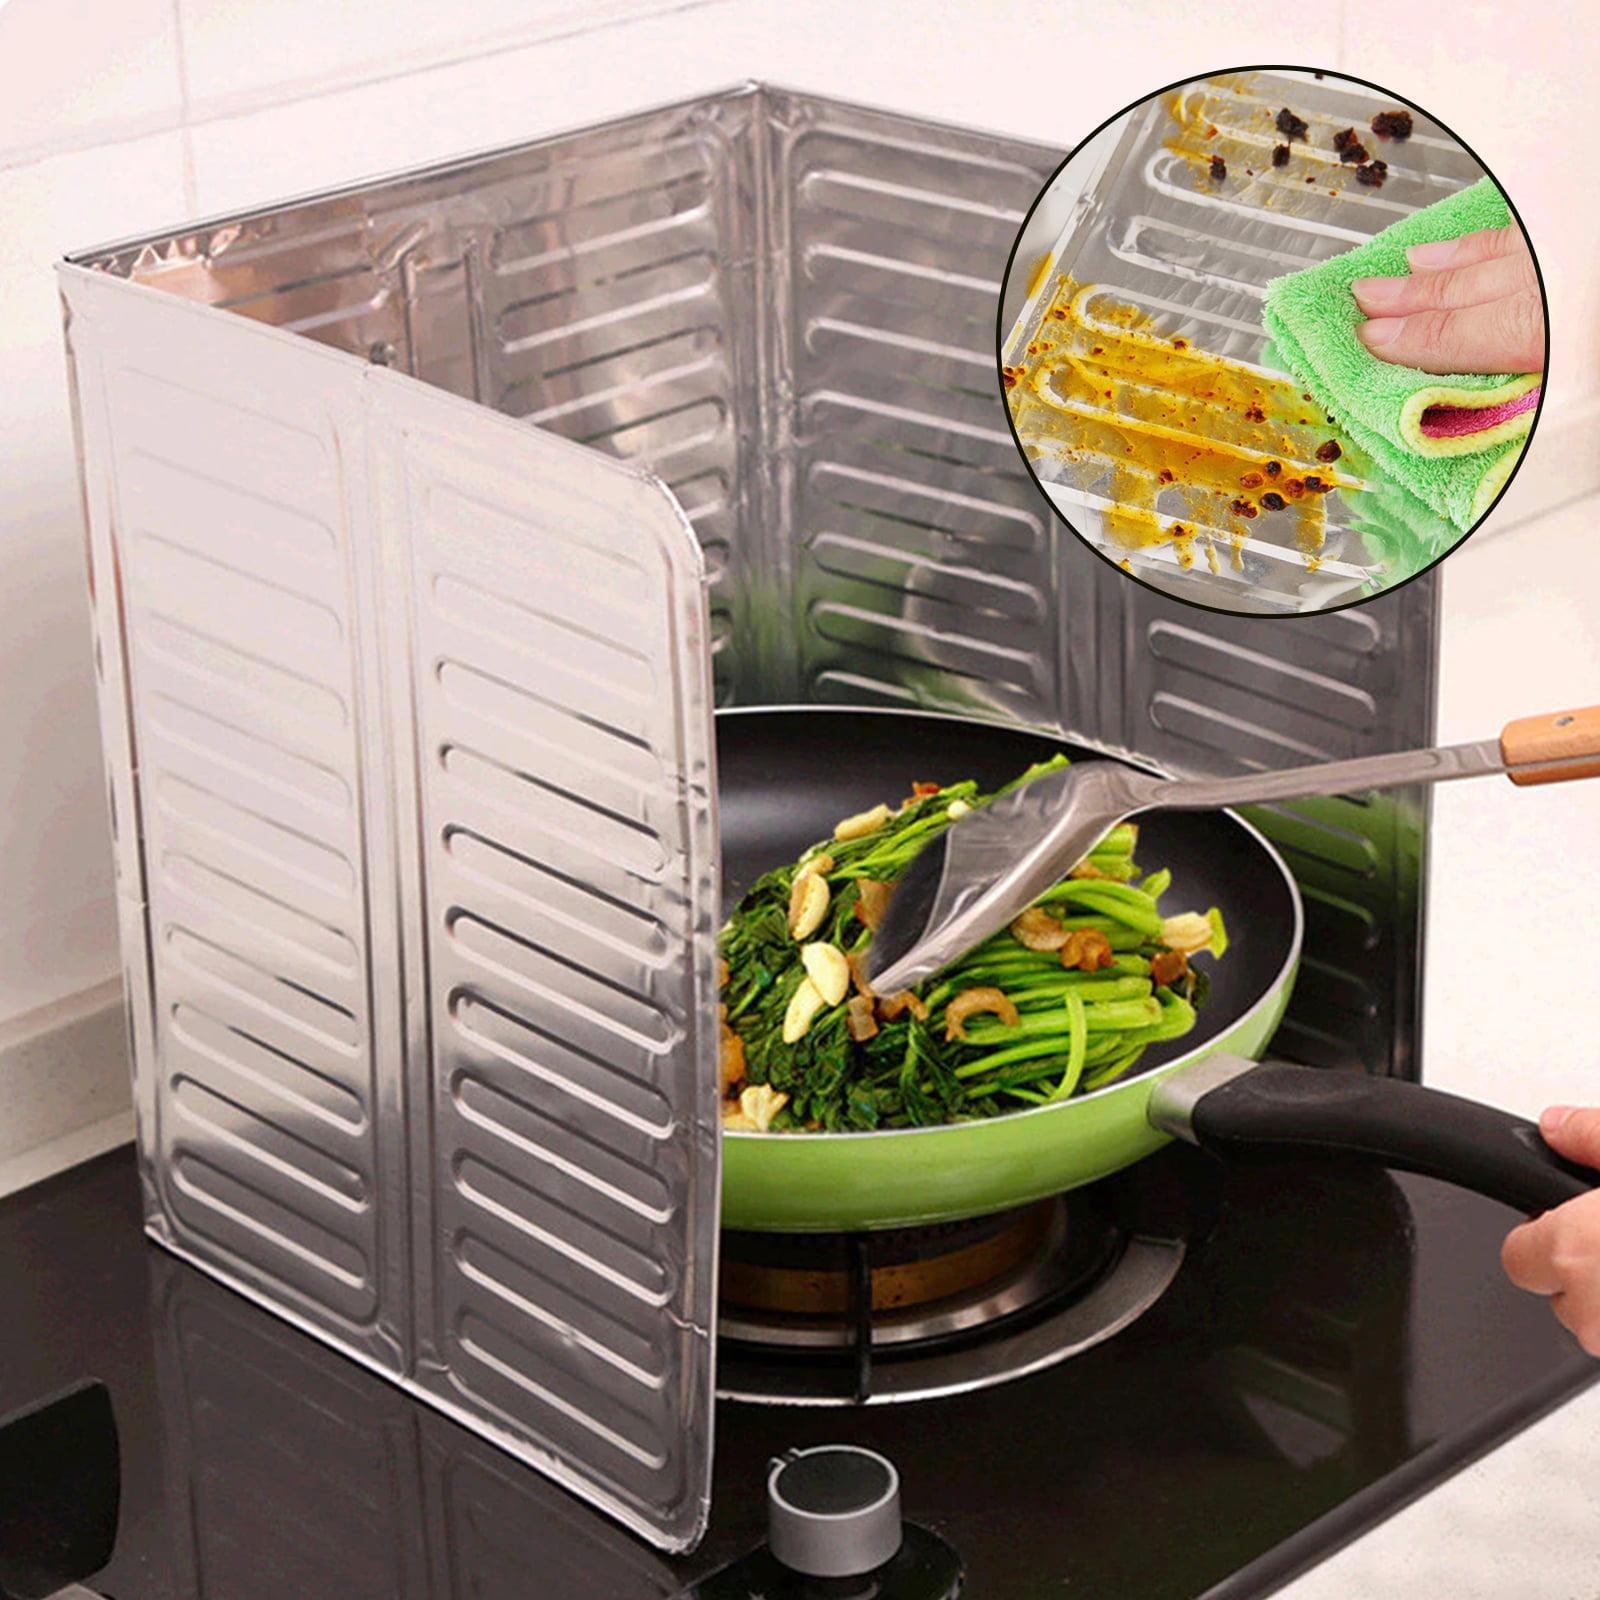 Oil Baffle Board Blue Kitchen Aluminum Cooking Anti Splatter Shield Cutlery Frying Pan Oil Splash Screen Cover